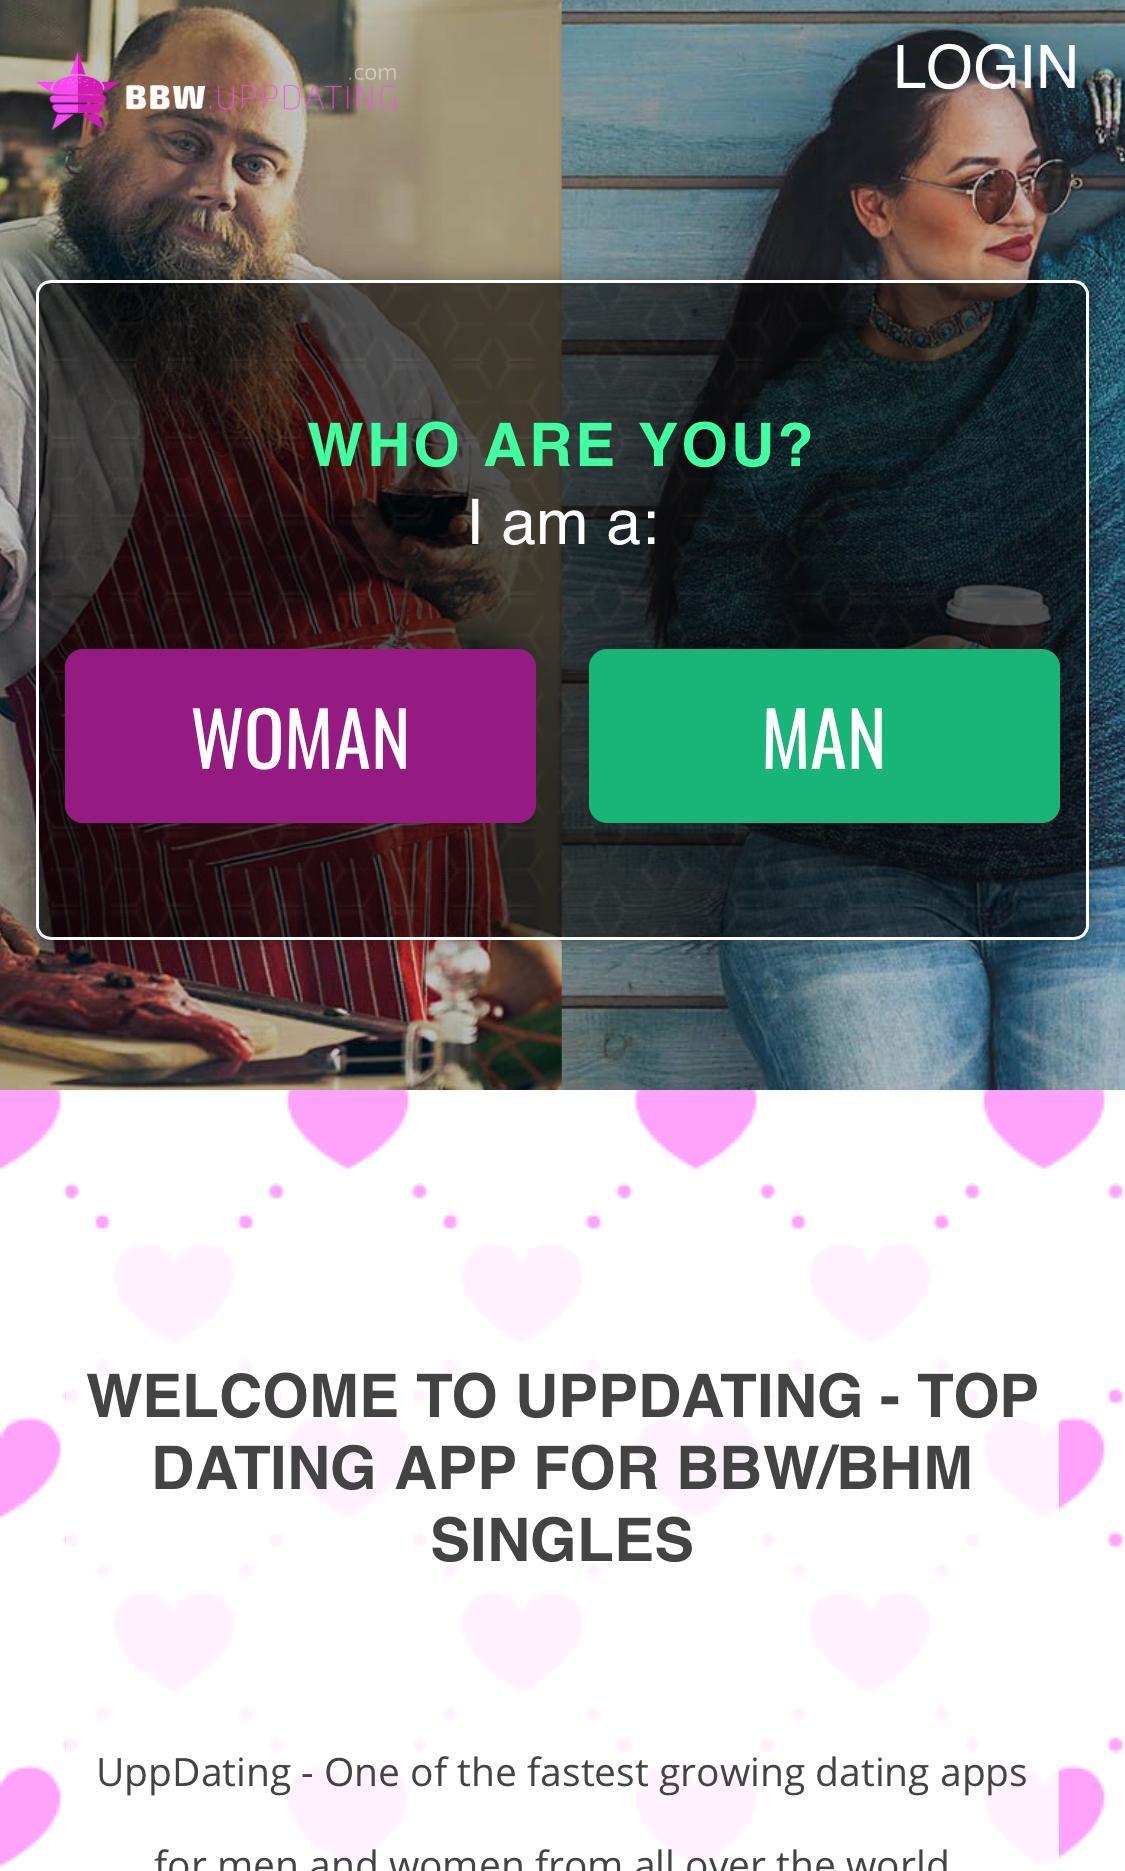 Film petrecerea burlacilor online dating